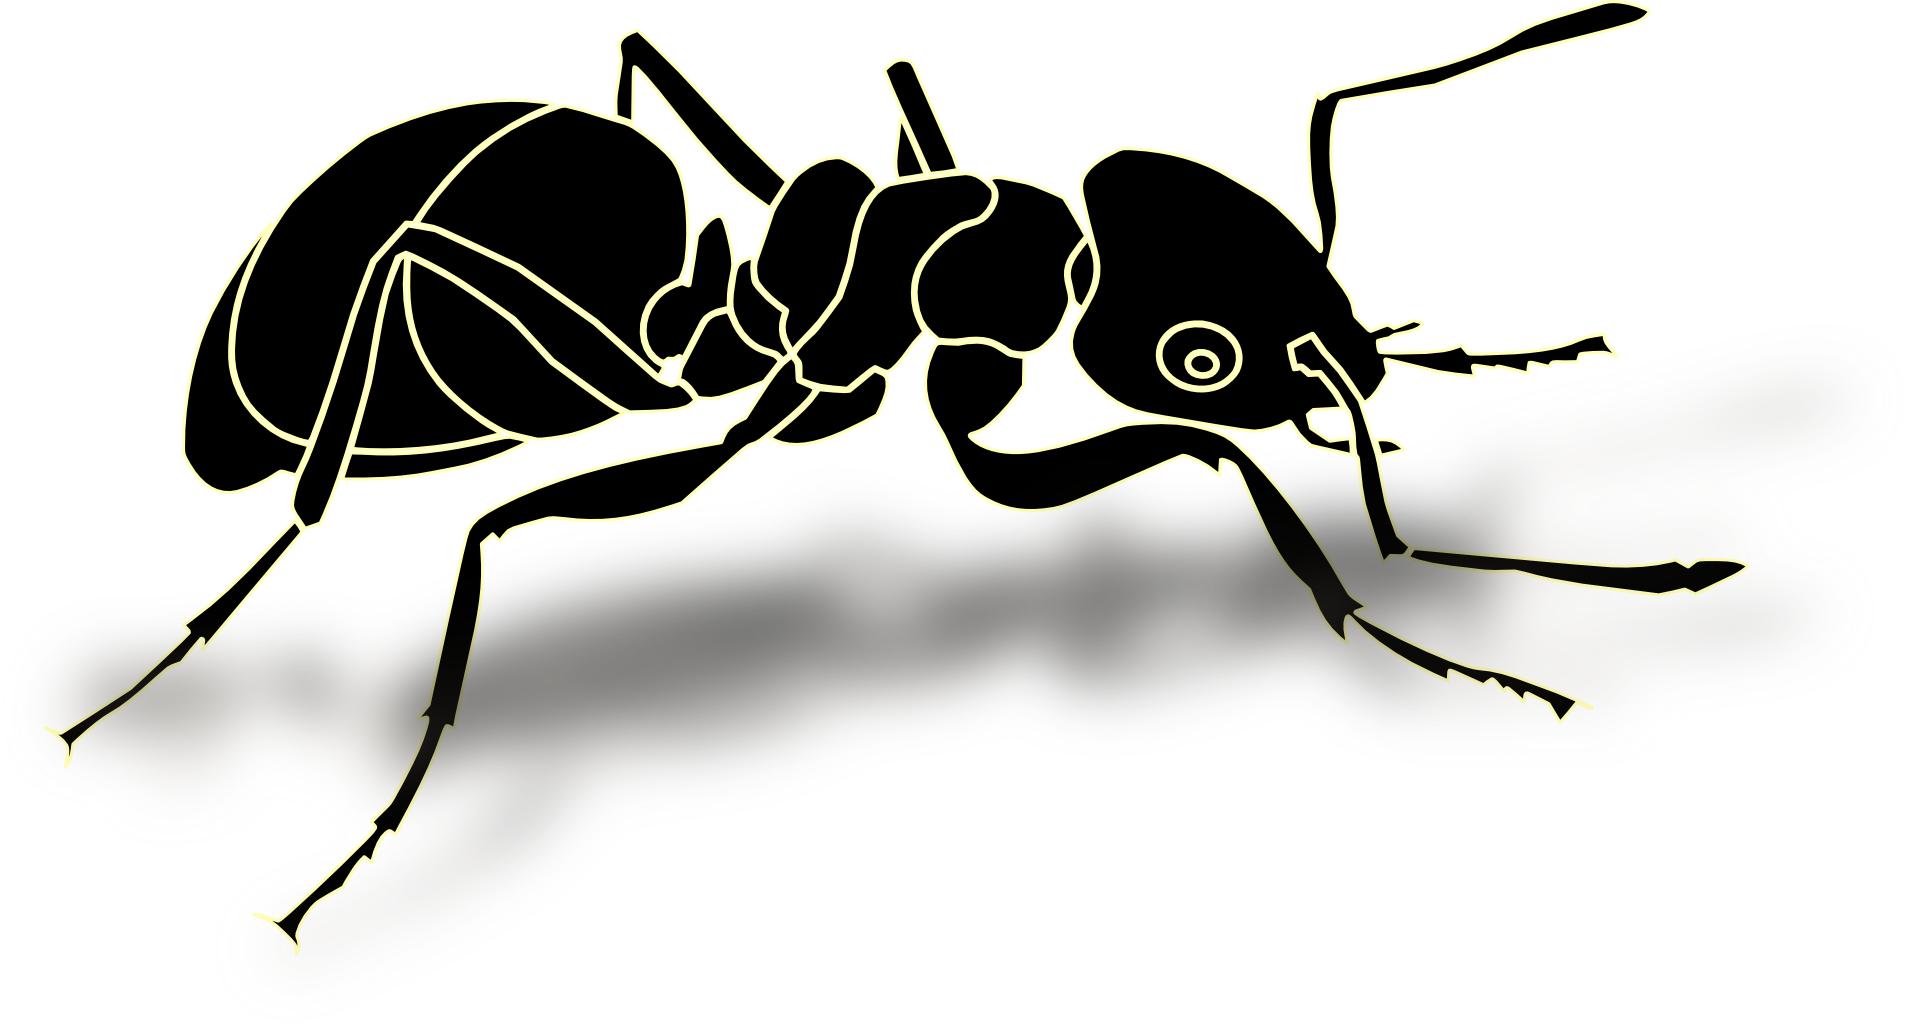 cartoon black ant www pixshark com images galleries Shark Fishing Clip shark drawing clip art